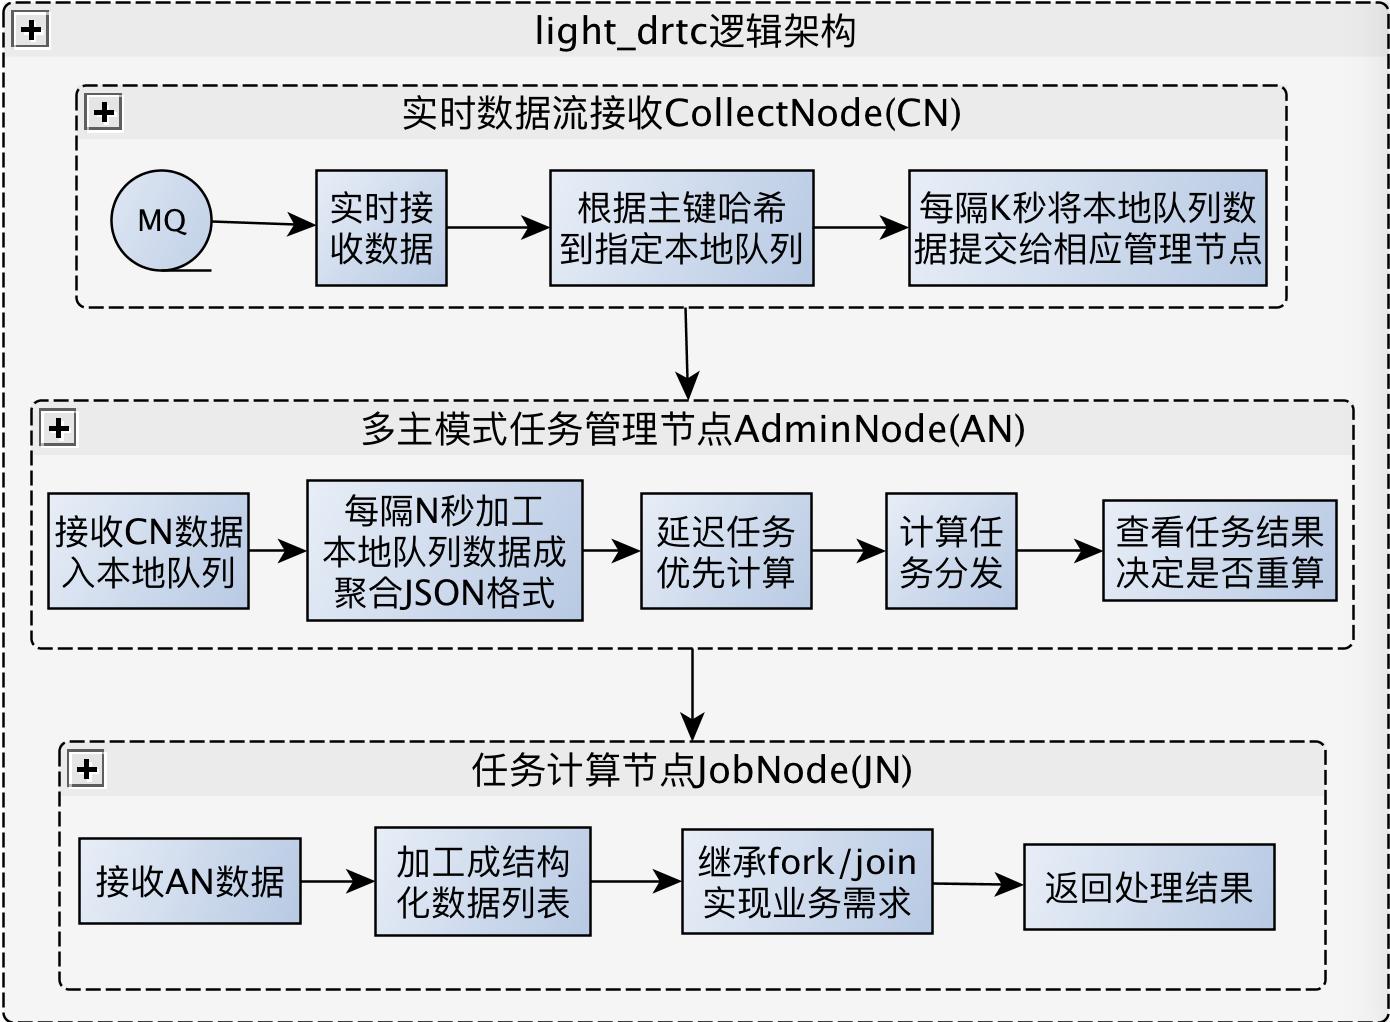 light_drtc逻辑架构1.png